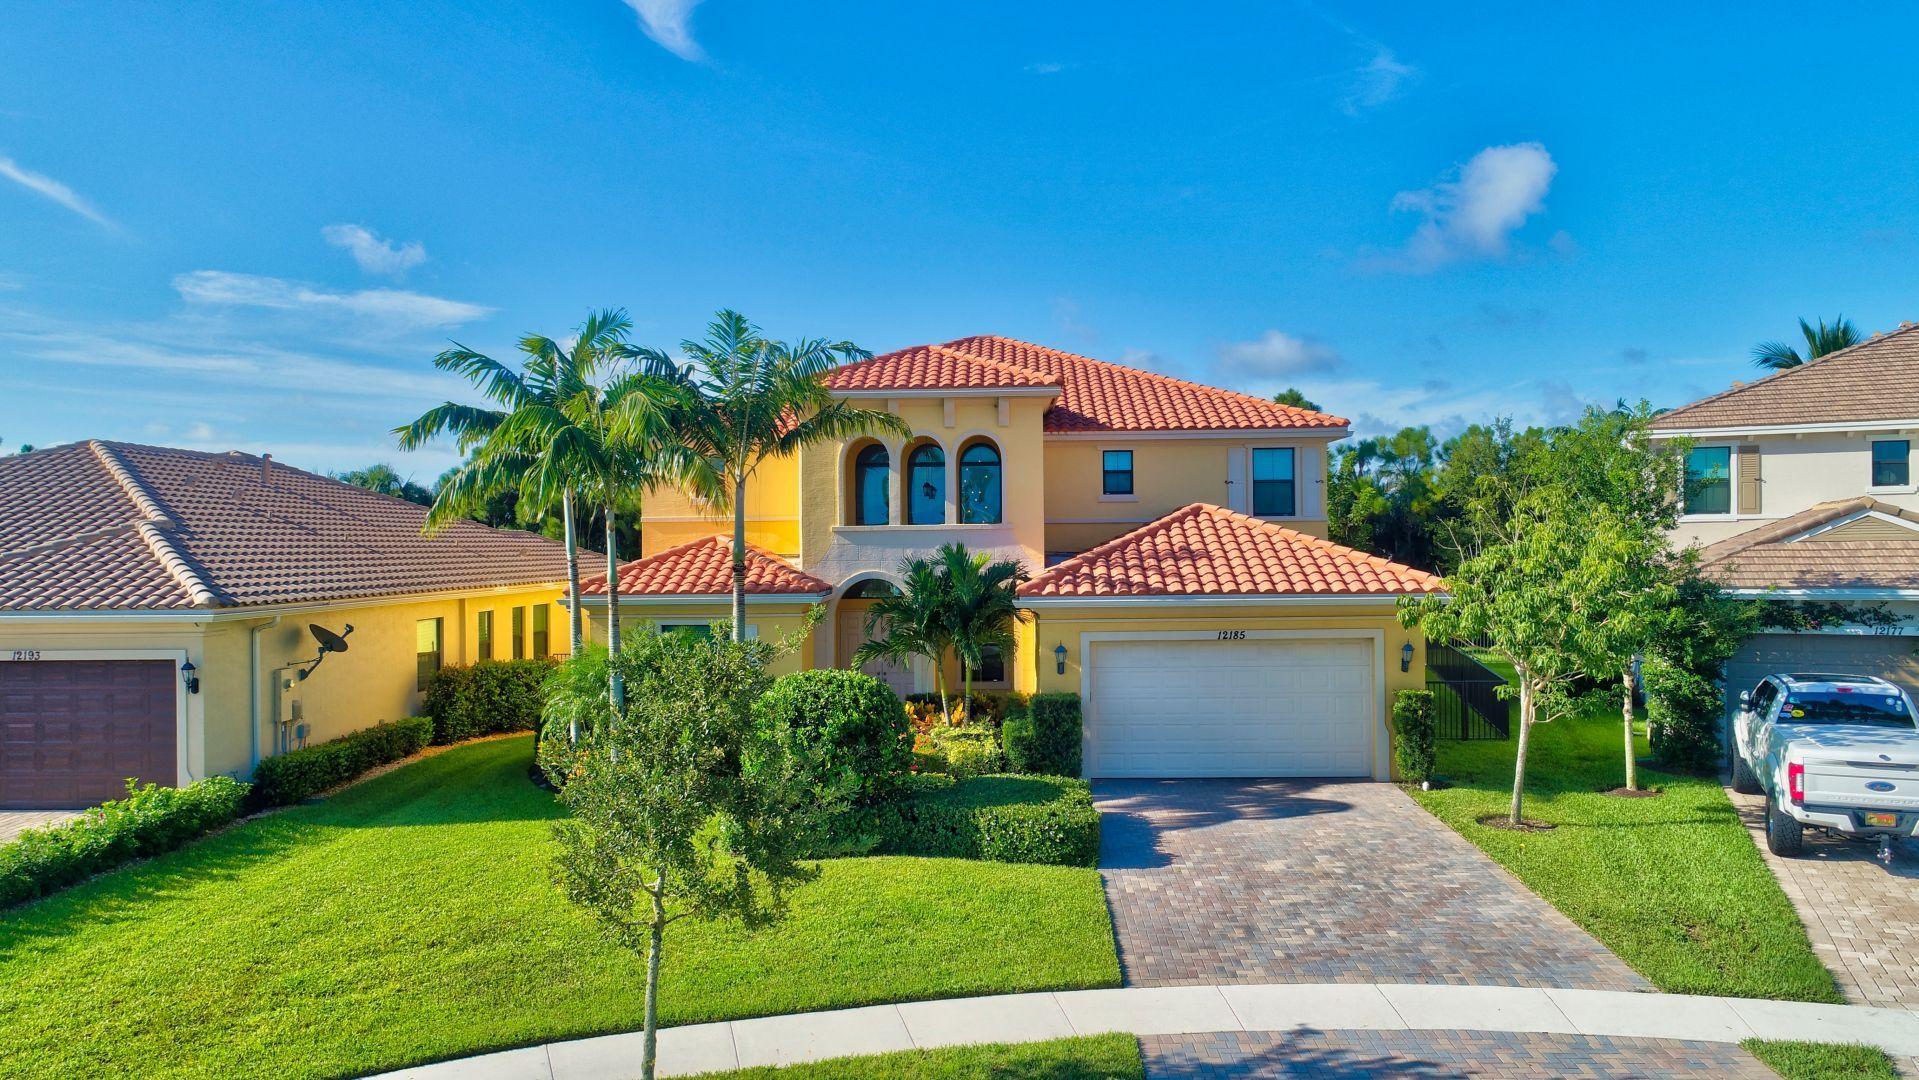 12185 Boca Reserve Lane Boca Raton, FL 33428